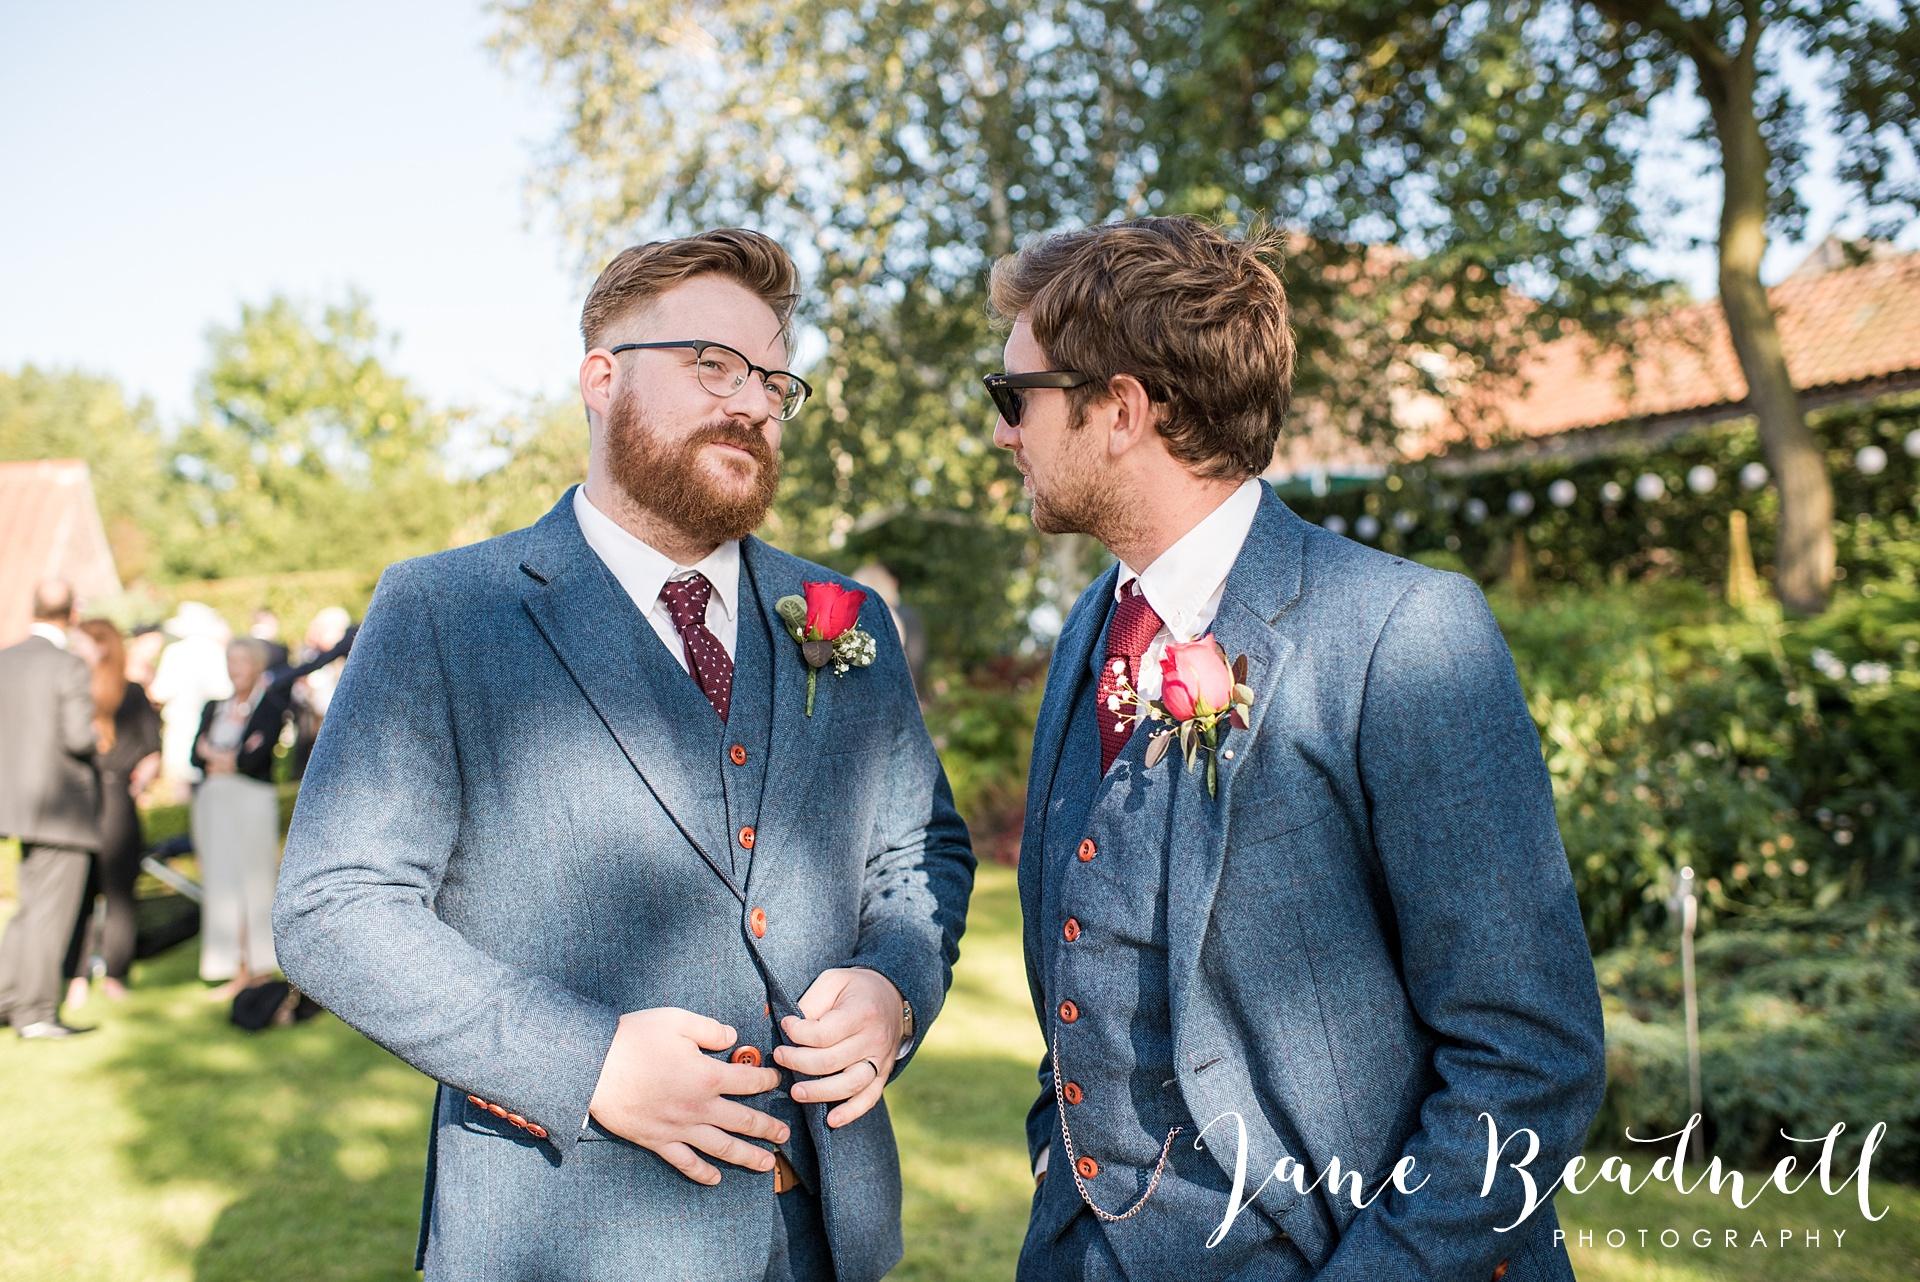 fine-art-wedding-photographer-jane-beadnell-yorkshire-wedding-photographer_0087